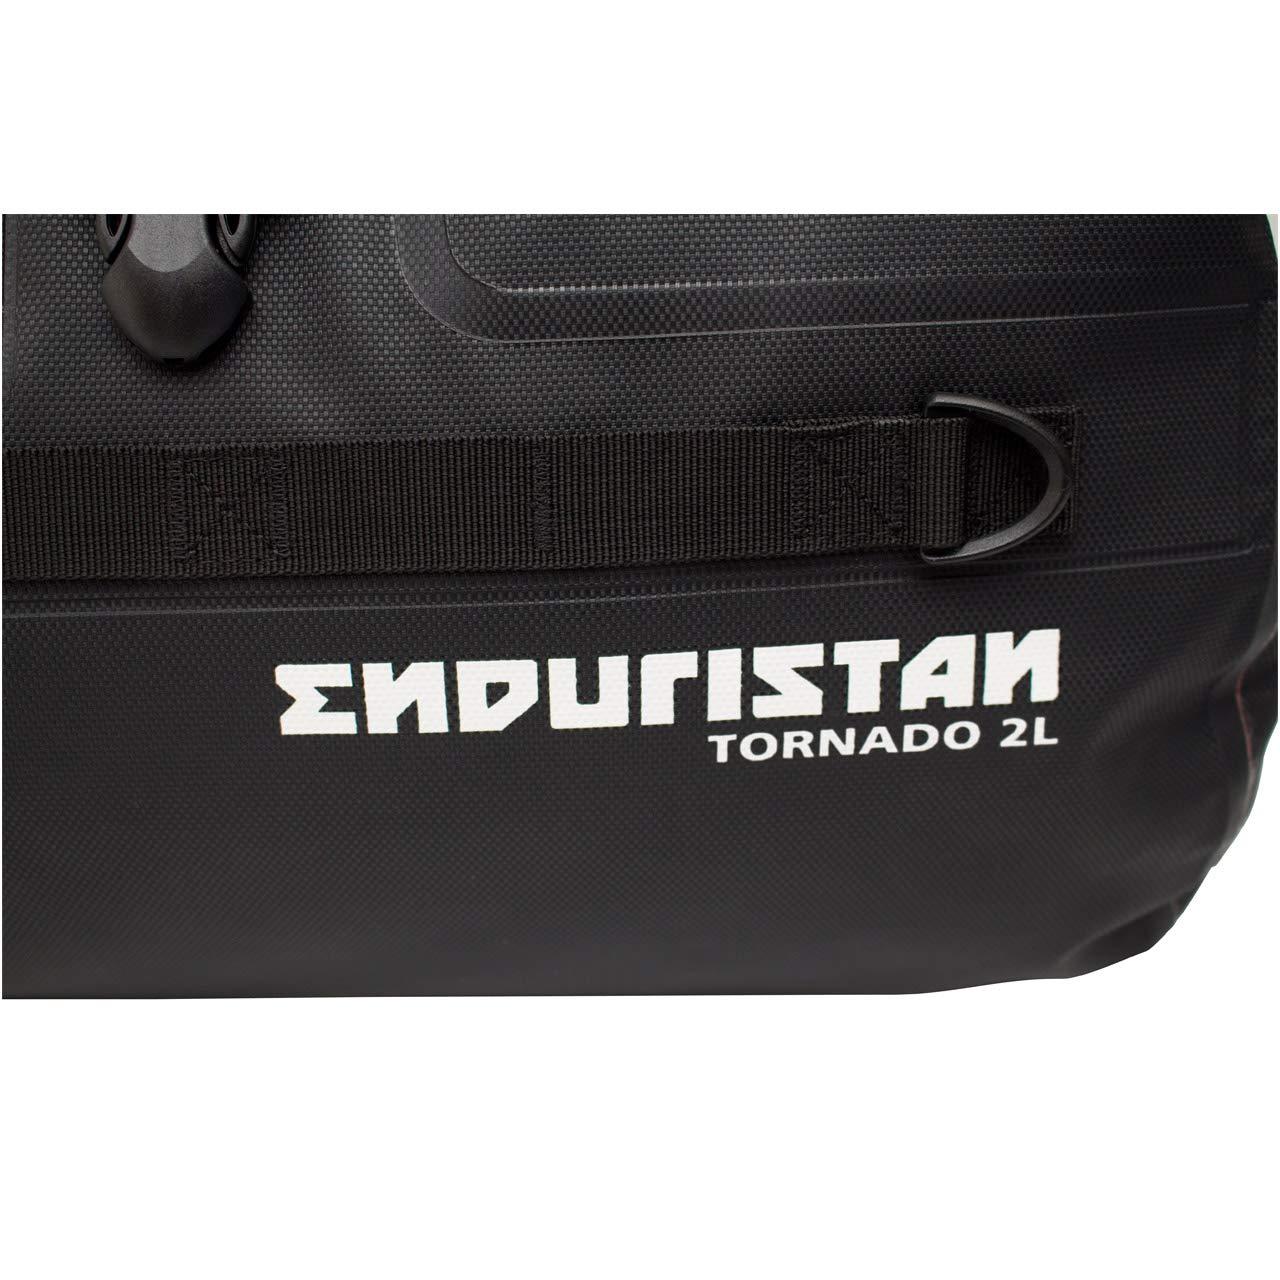 Enduristan Tornado 2 Pack Large Luggage Roll//Duffel Bag 100/% Waterproof Size L Volume 51 Litres